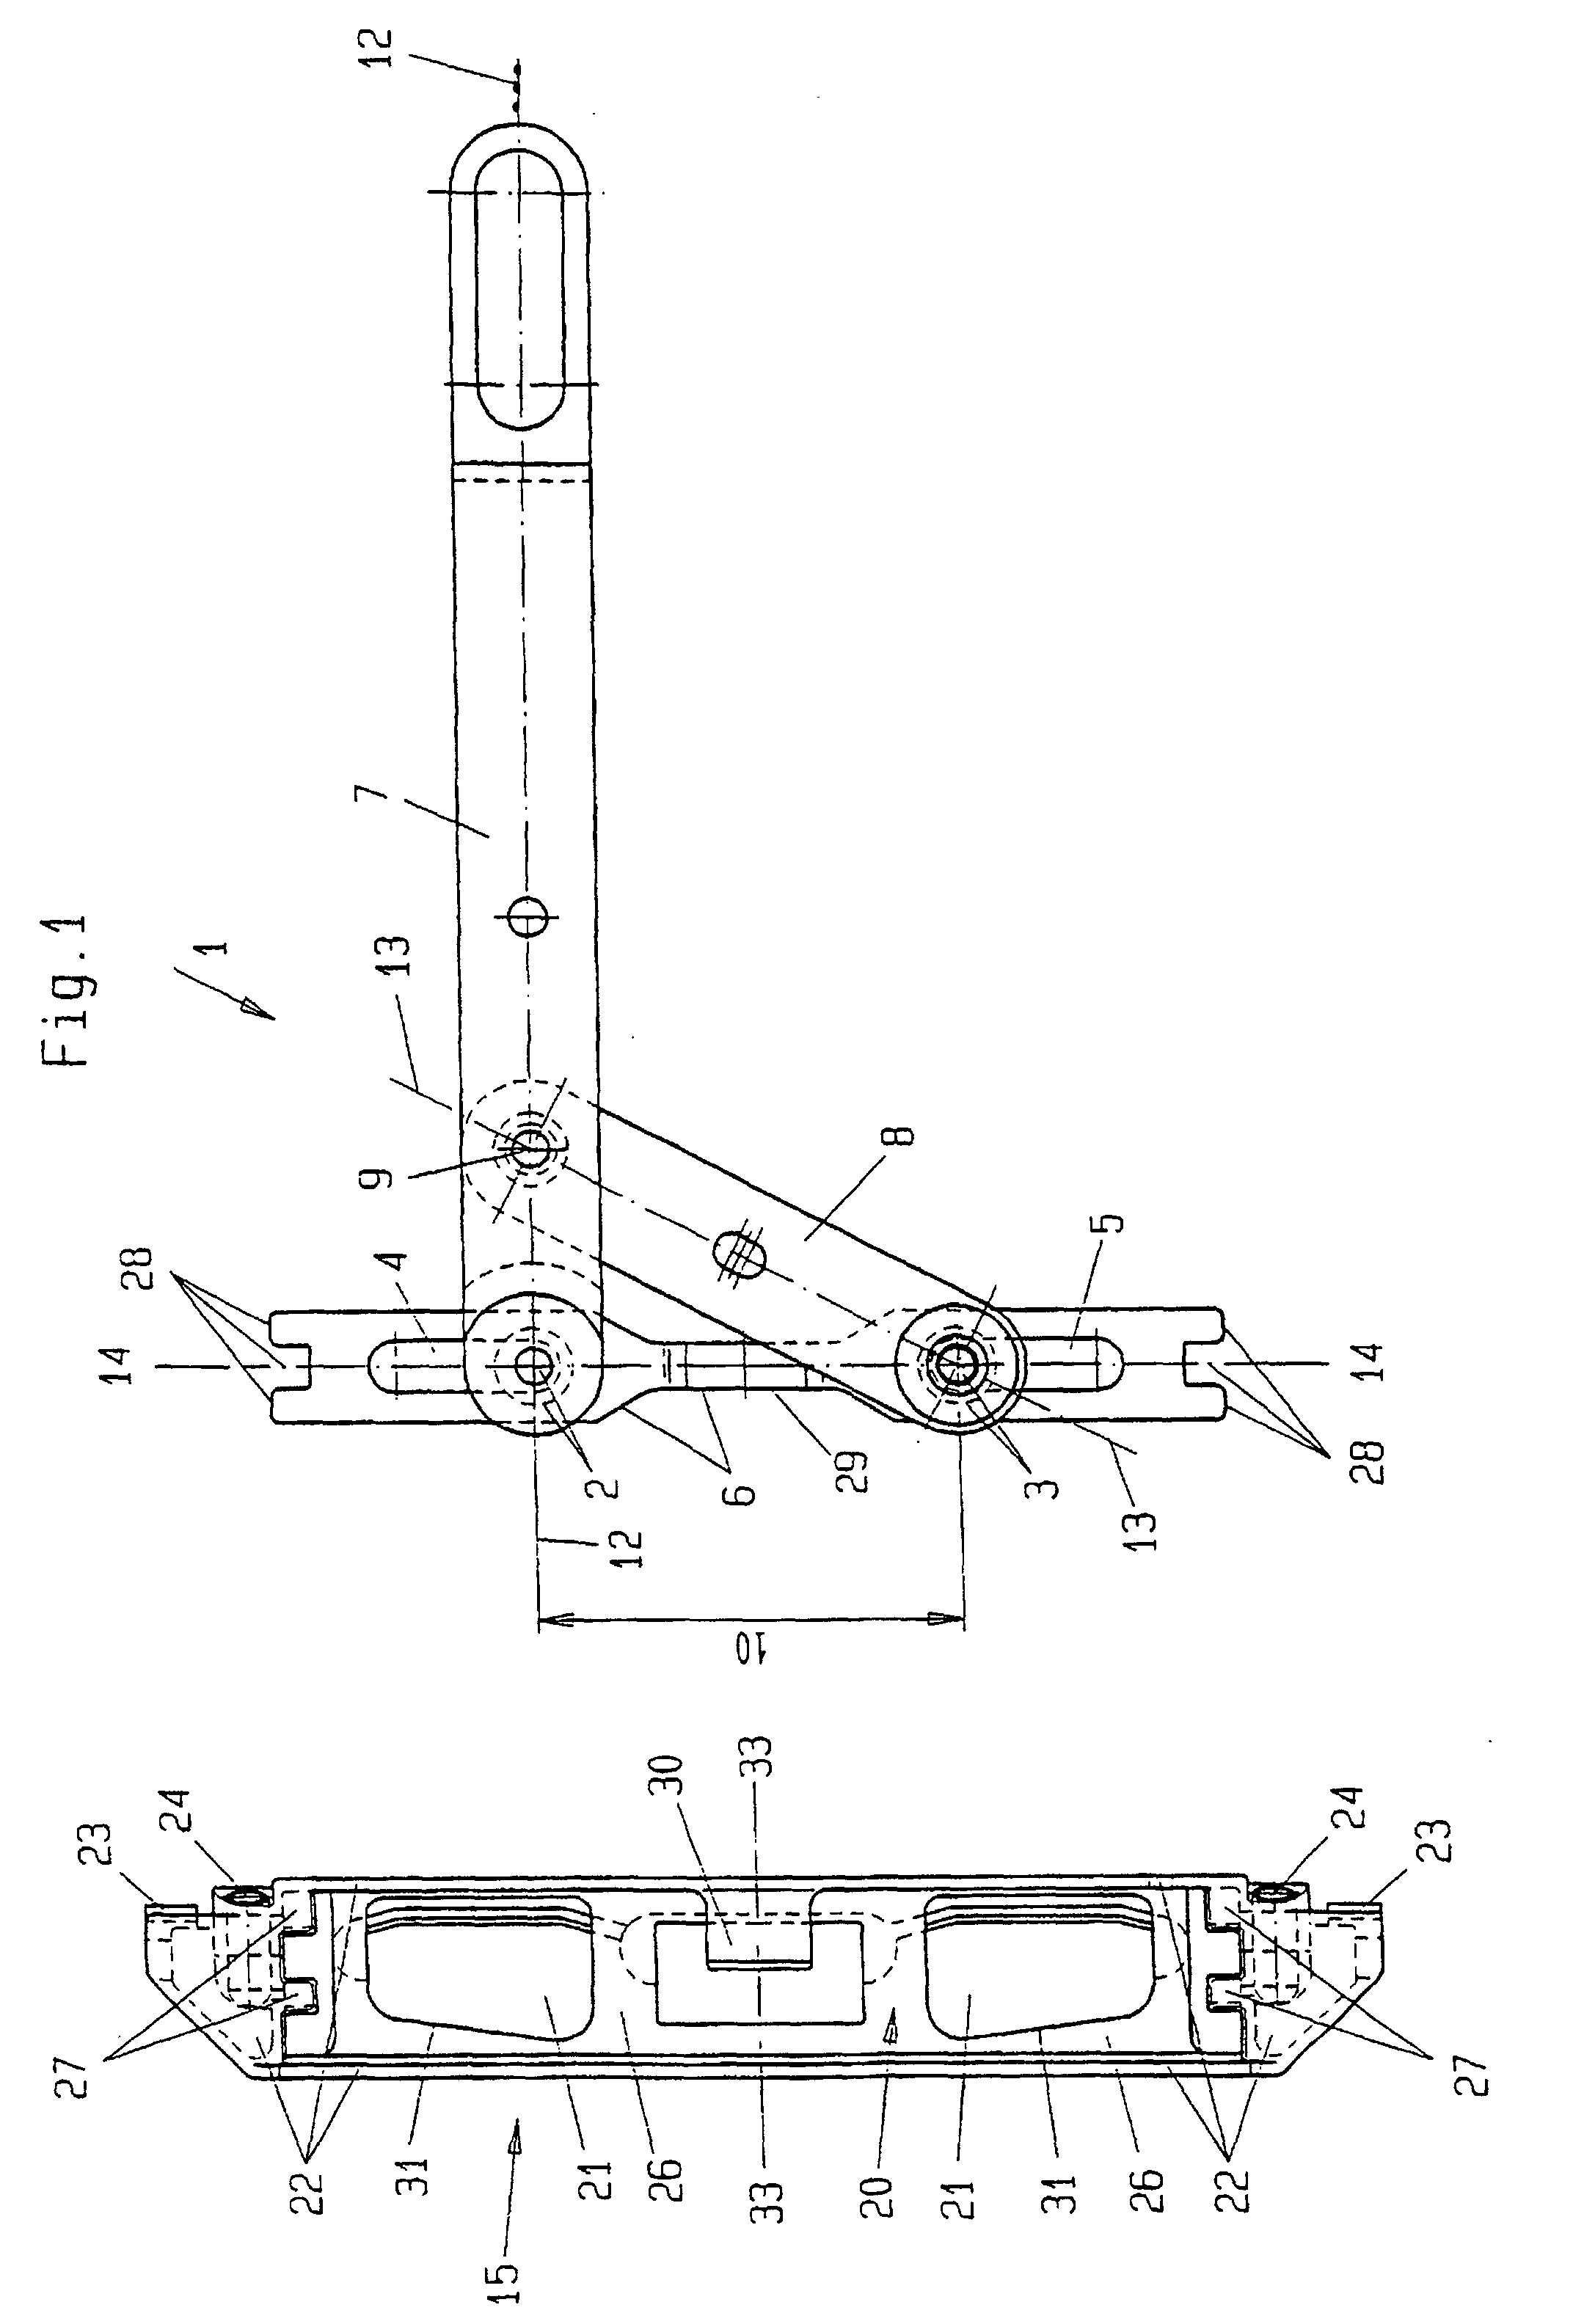 patent ep0823522b1 falz hebelgetriebe f r fenster oder t ren google patents. Black Bedroom Furniture Sets. Home Design Ideas